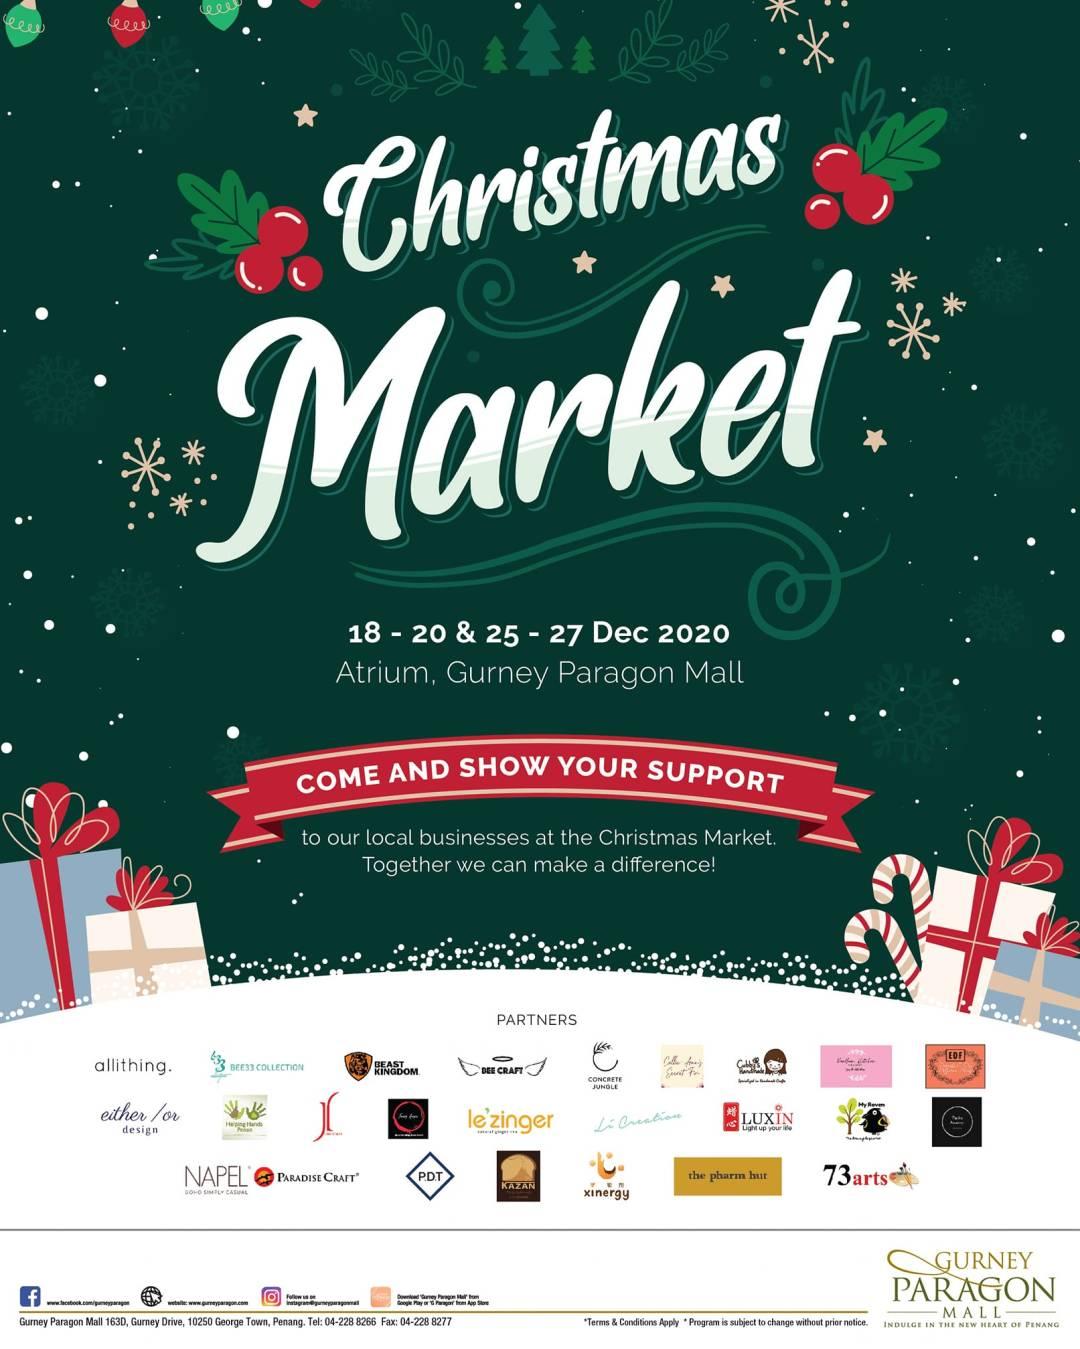 Gurney Paragon Christmas market